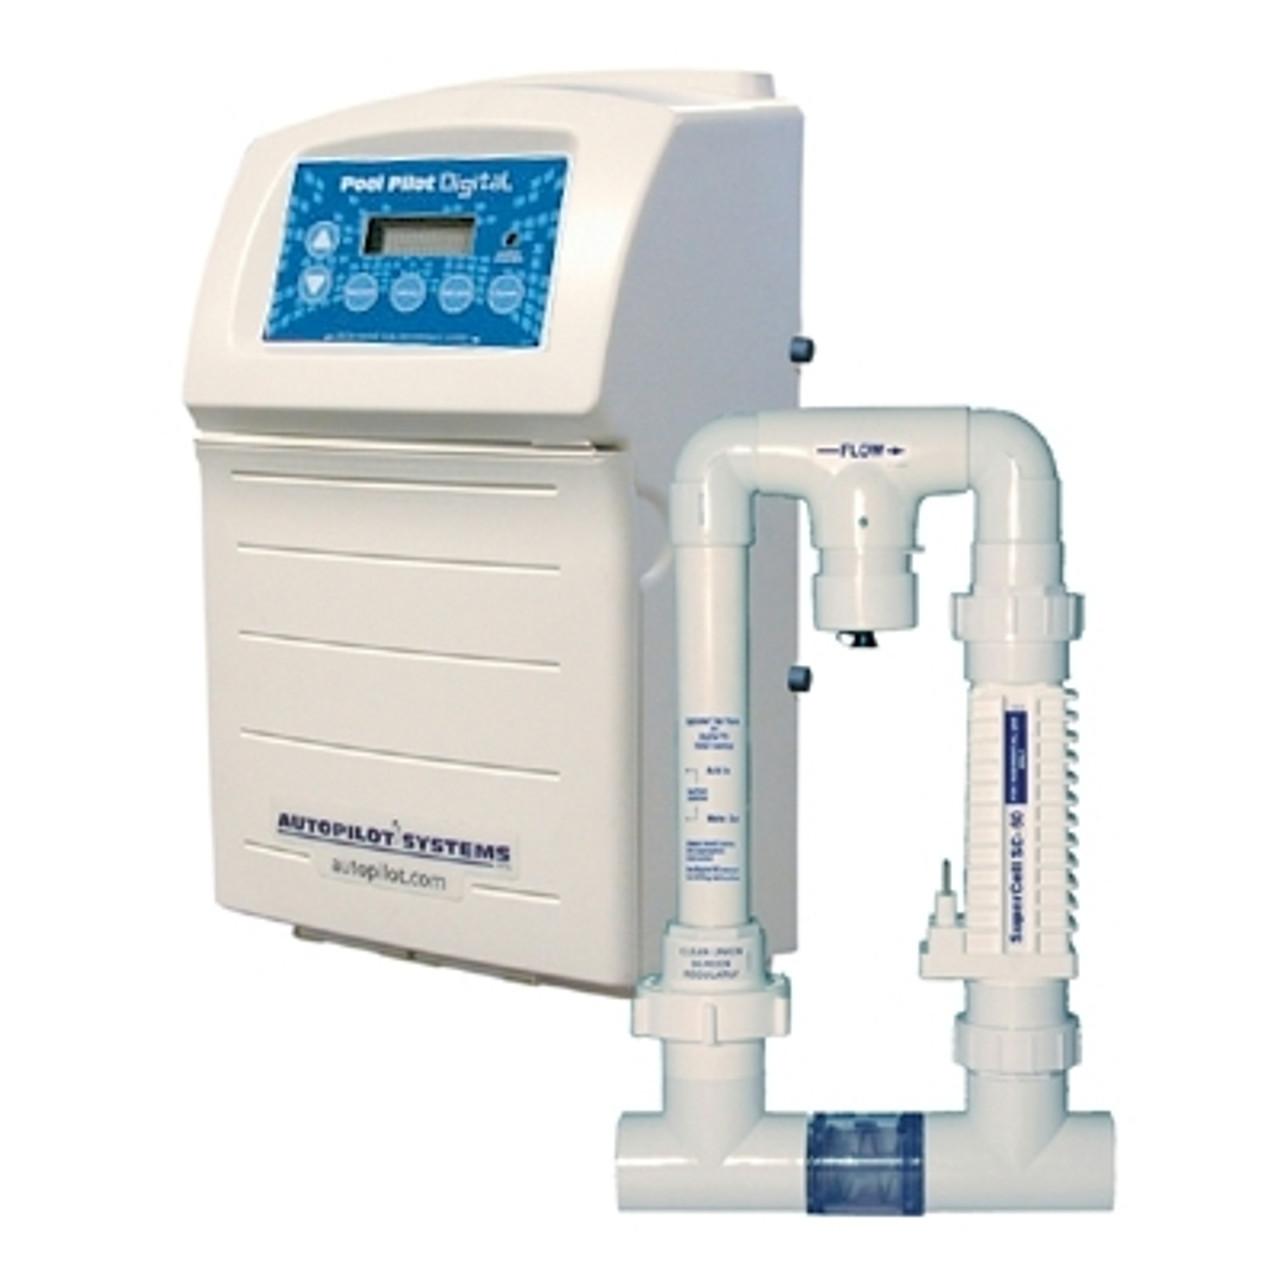 AutoPilot Pool Pilot Digital Salt Power Supply System - 220V - DIG-220  with RC-35 / SC-36 Cell